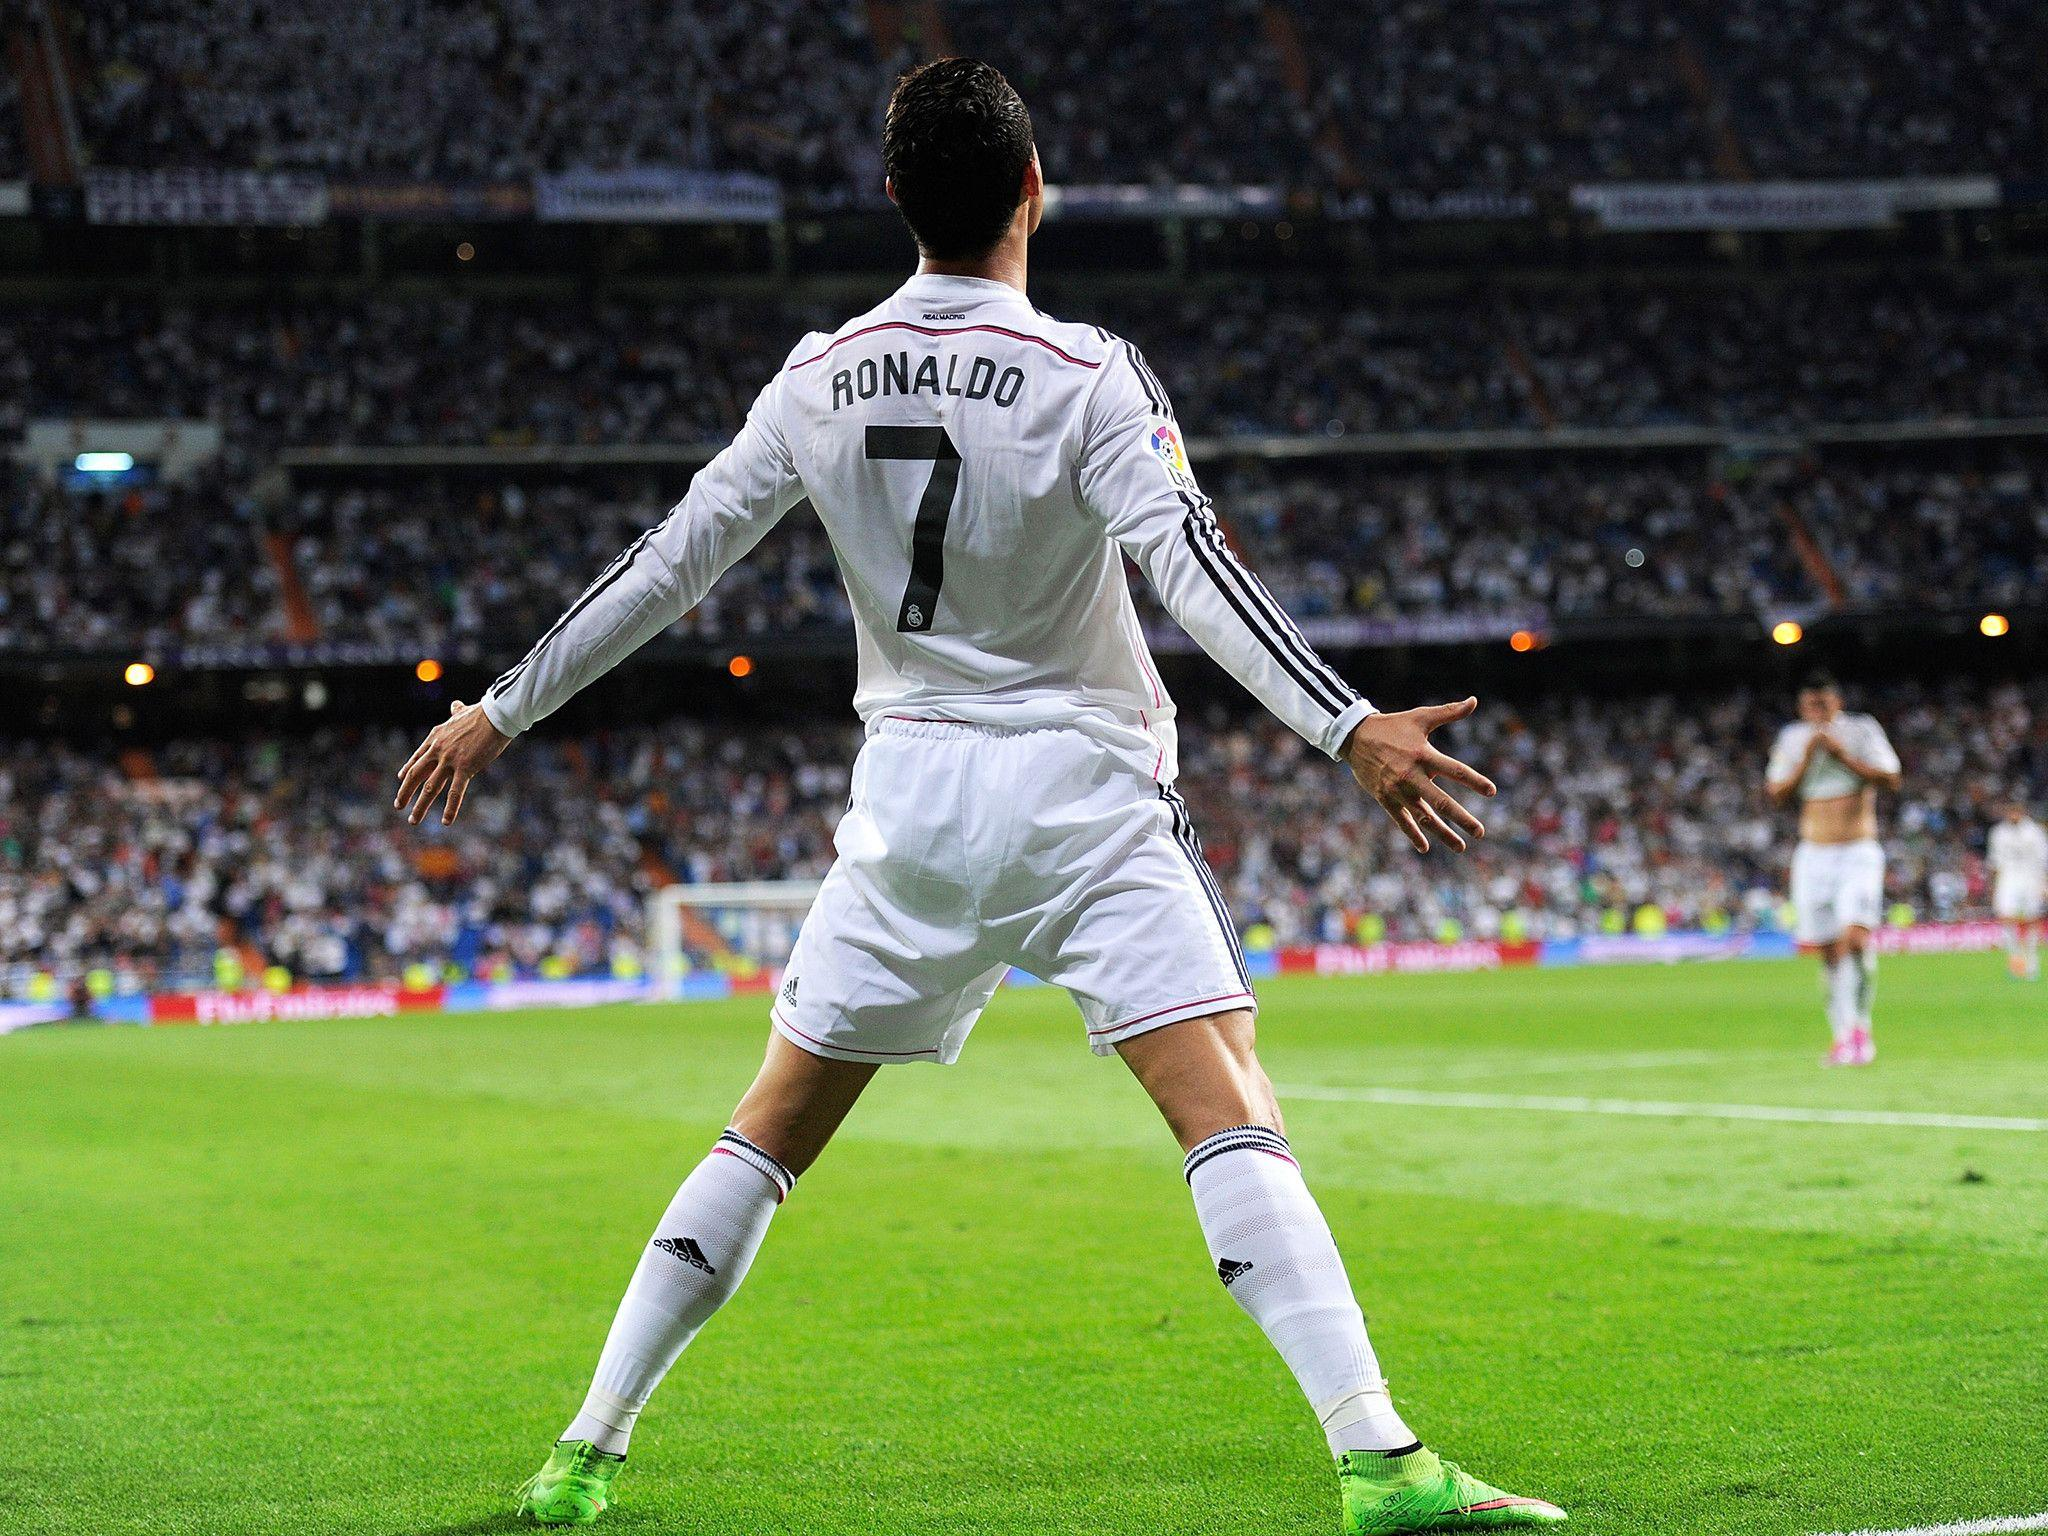 Full Hd Cristiano Ronaldo Celebration Wallpaper Imagefootball